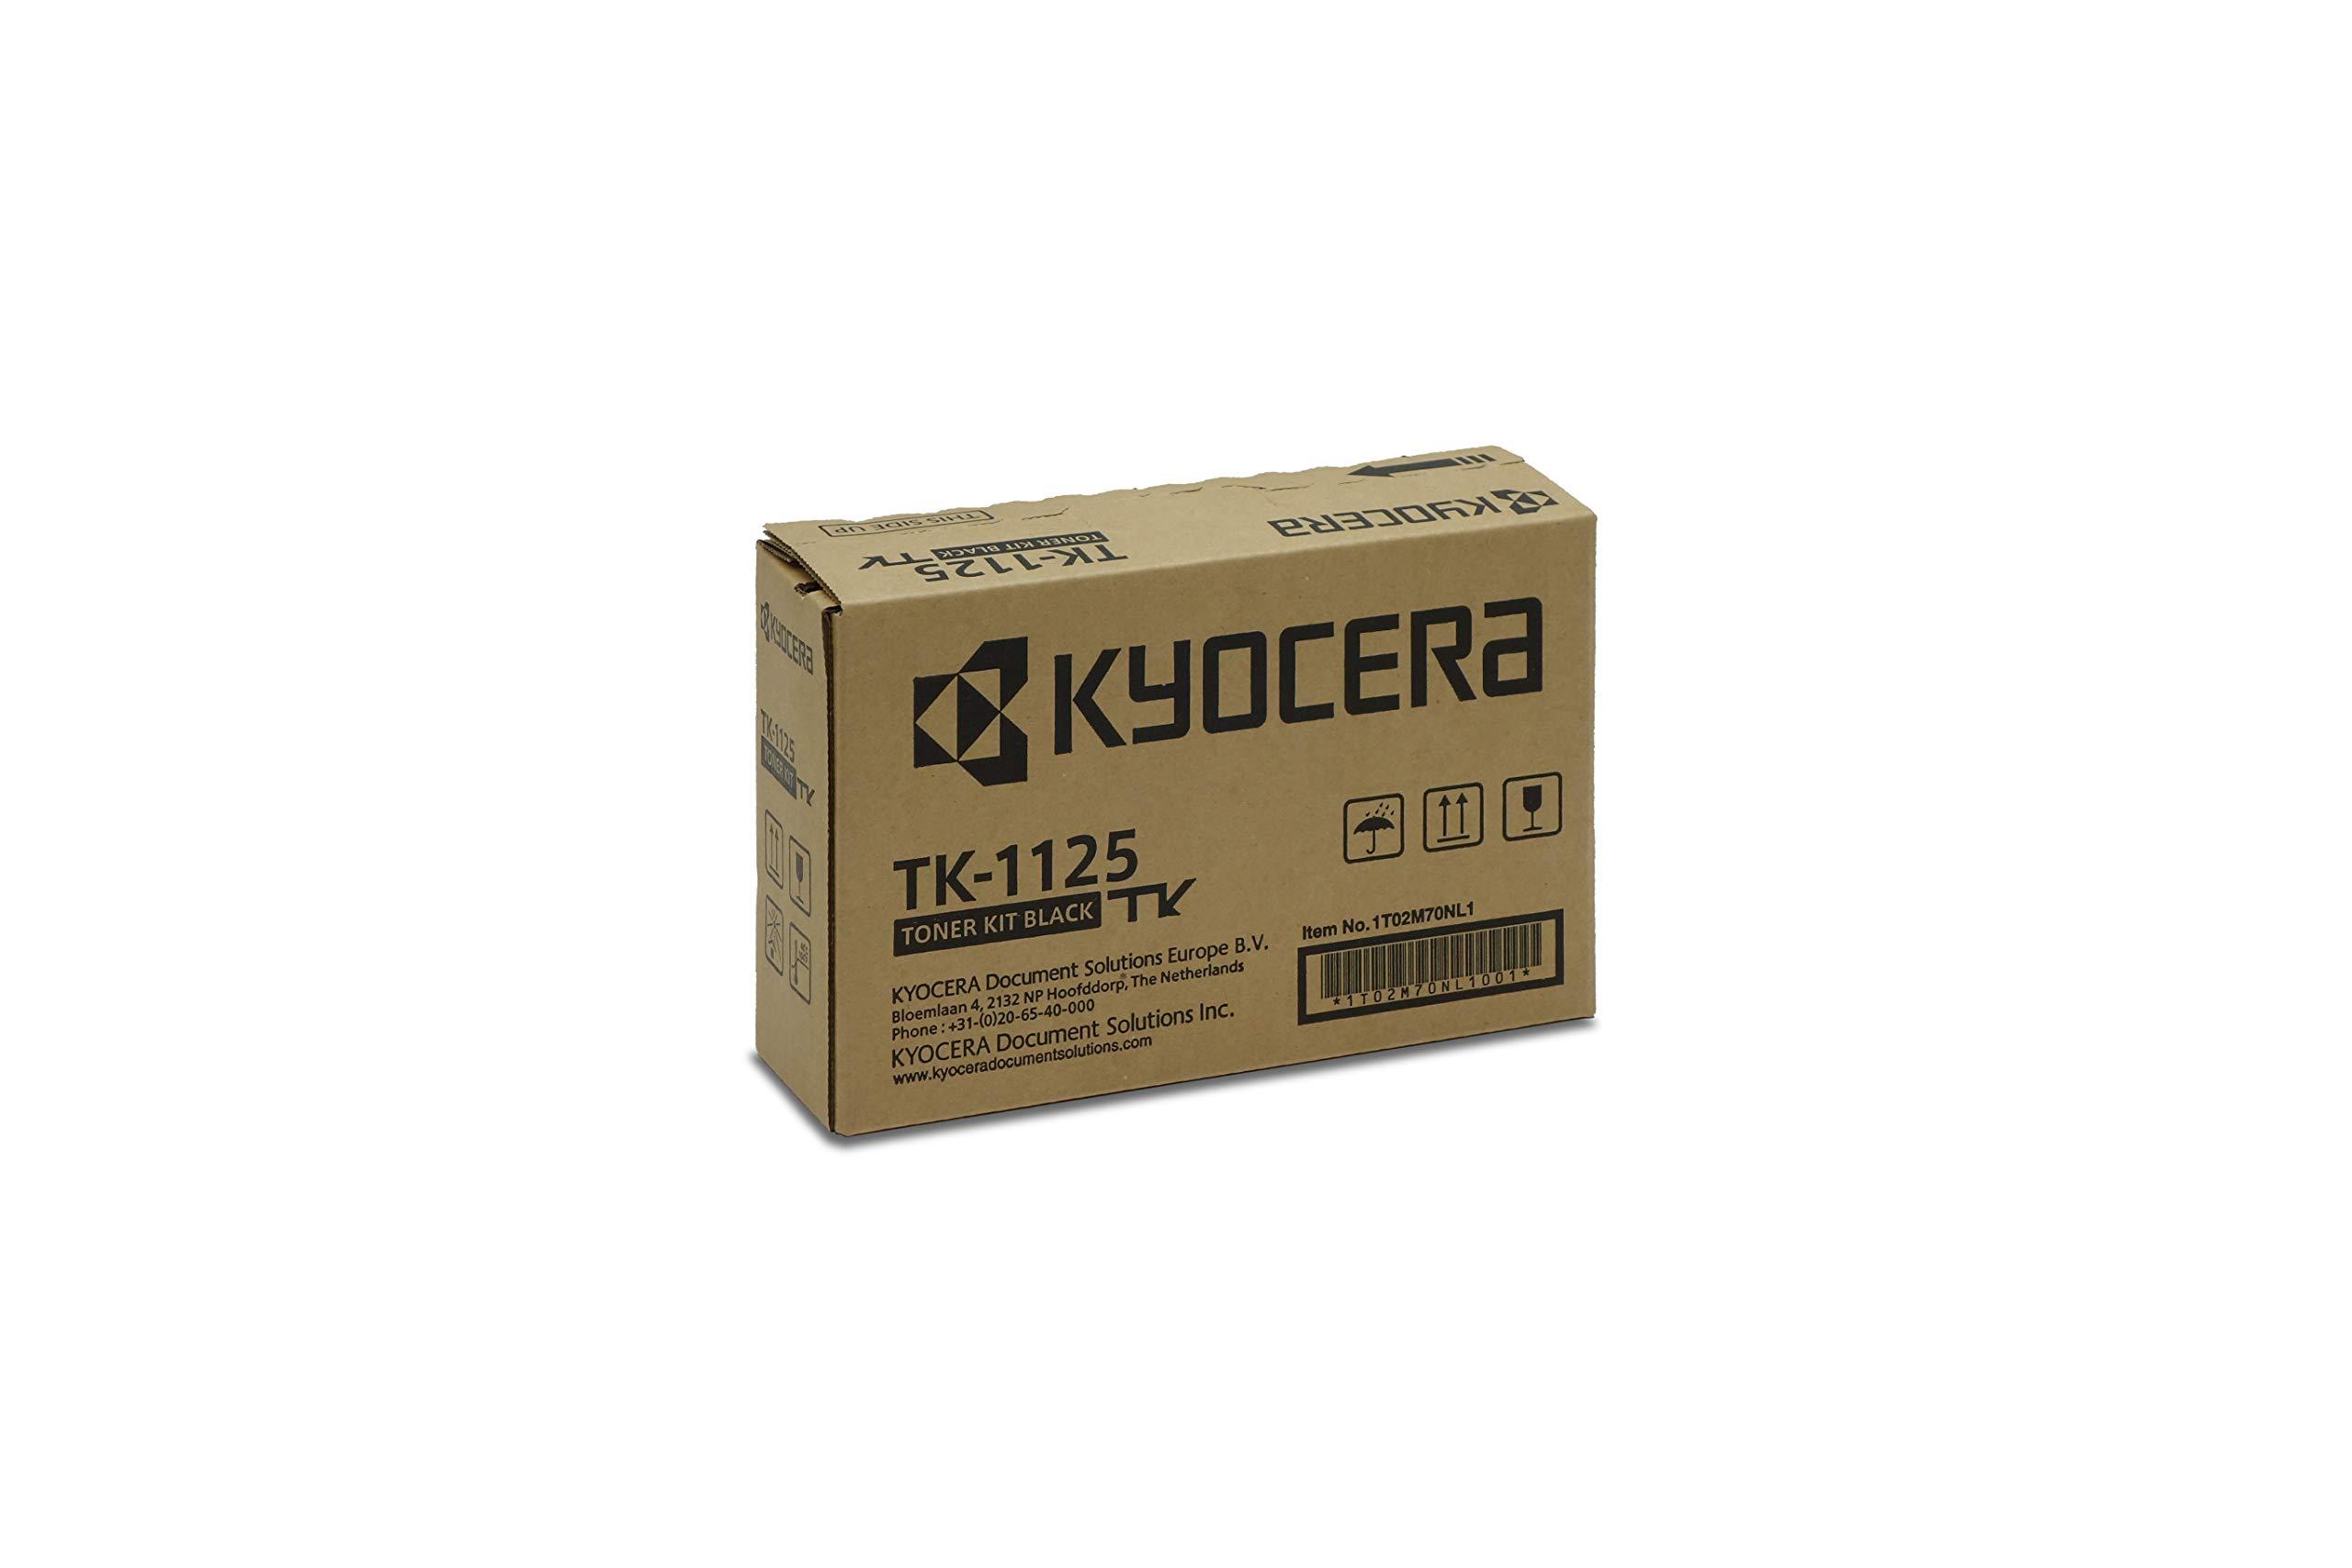 Kyocera-TK-1125-Original-Toner-Kartusche-Schwarz-1T02M70NL1-Kompatibel-fr-FS-1061DN-FS-1325MFP